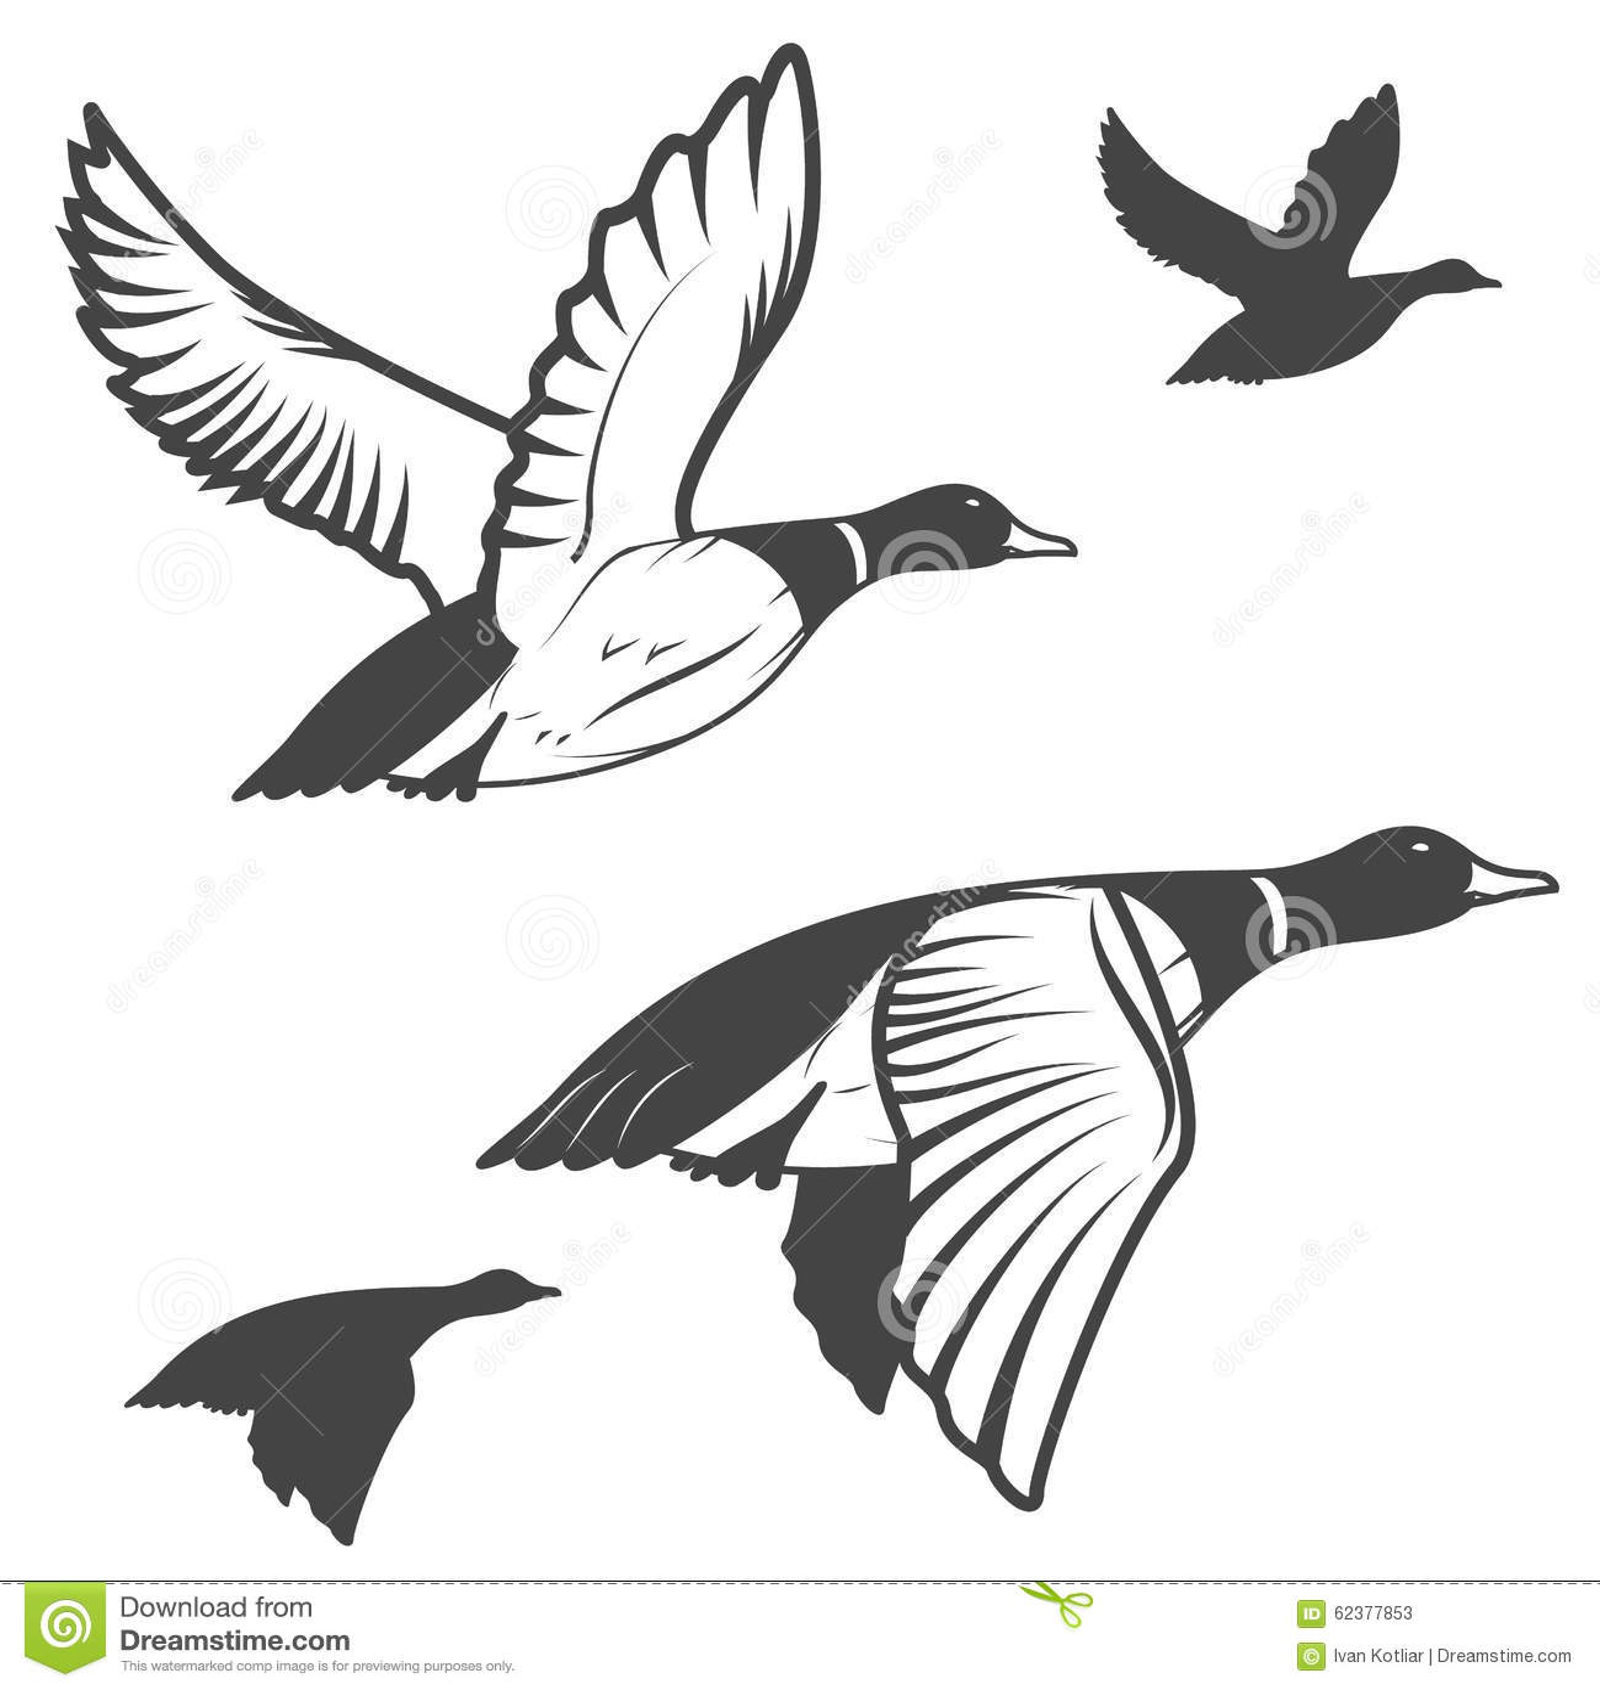 Gallery as well 795085 moreover Winchester Ammo 5 besides 90 Landschaft Tattoos Fur Manner Scenic Design Ideen also Stock Illustration Wild Duck Set Flying Ducks Hunting Mallard Flying Vector Illustration Image62377853. on deer hunting design